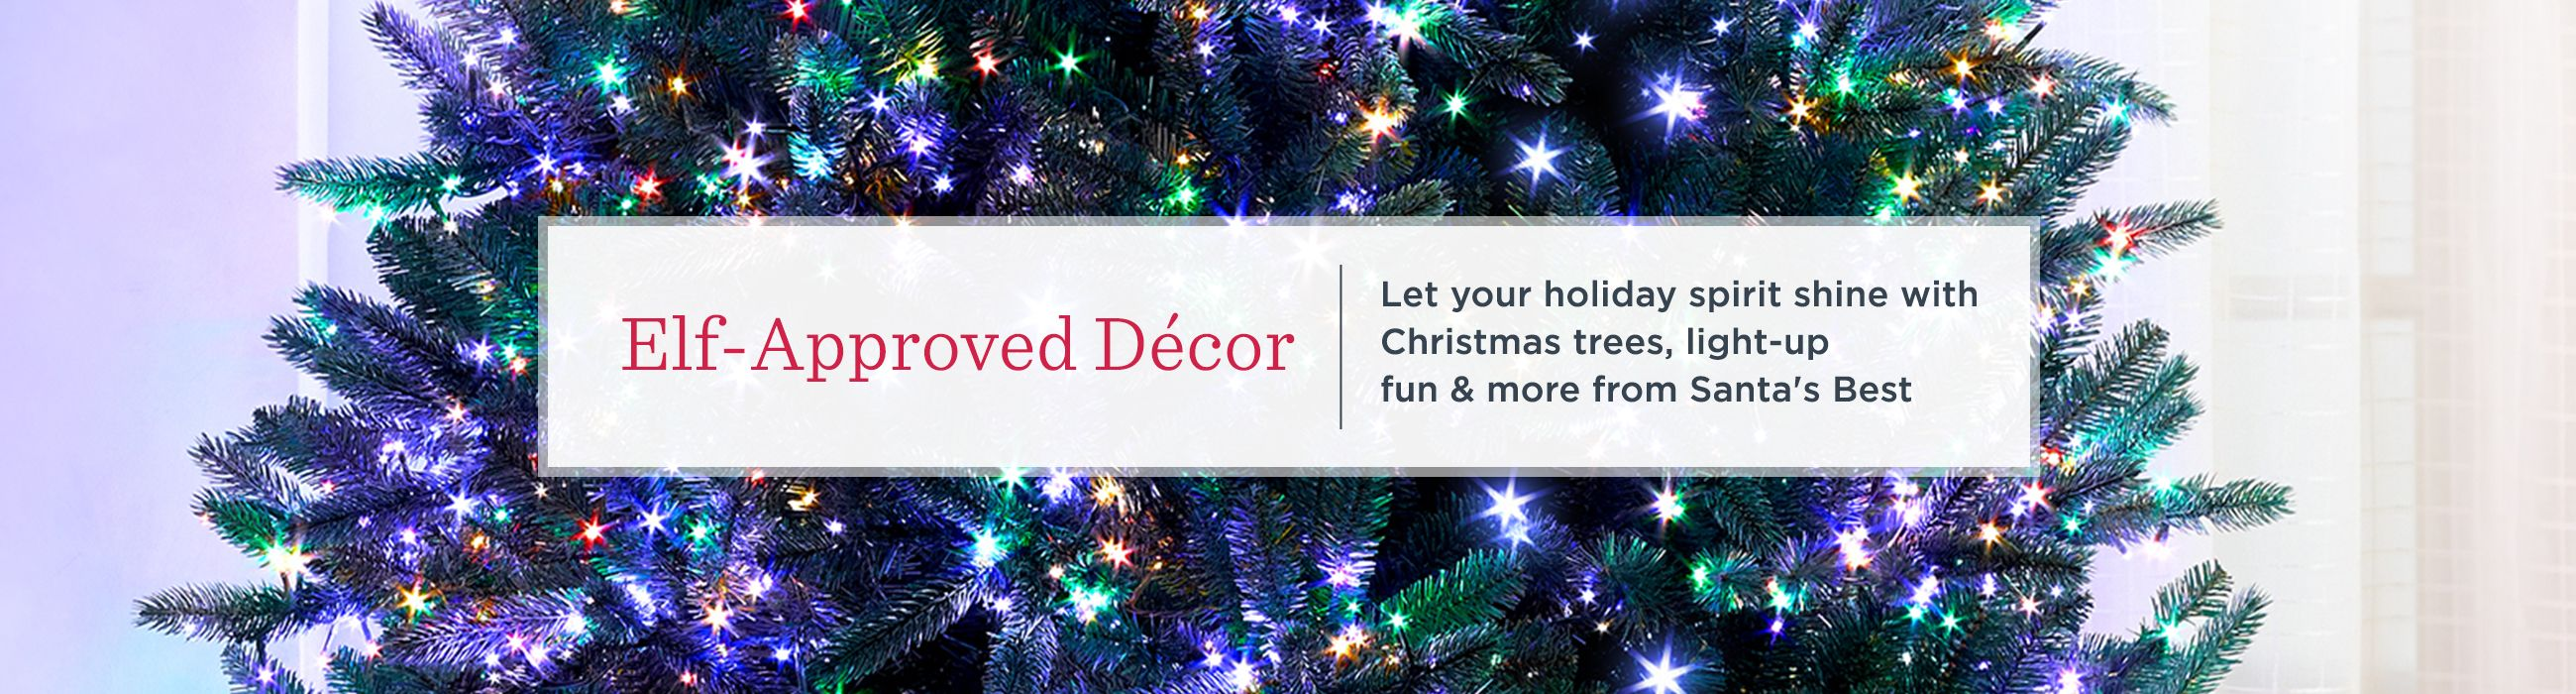 santa best lit christmas trees jpg 2600x700 santa best lit christmas trees - Santas Best Christmas Trees